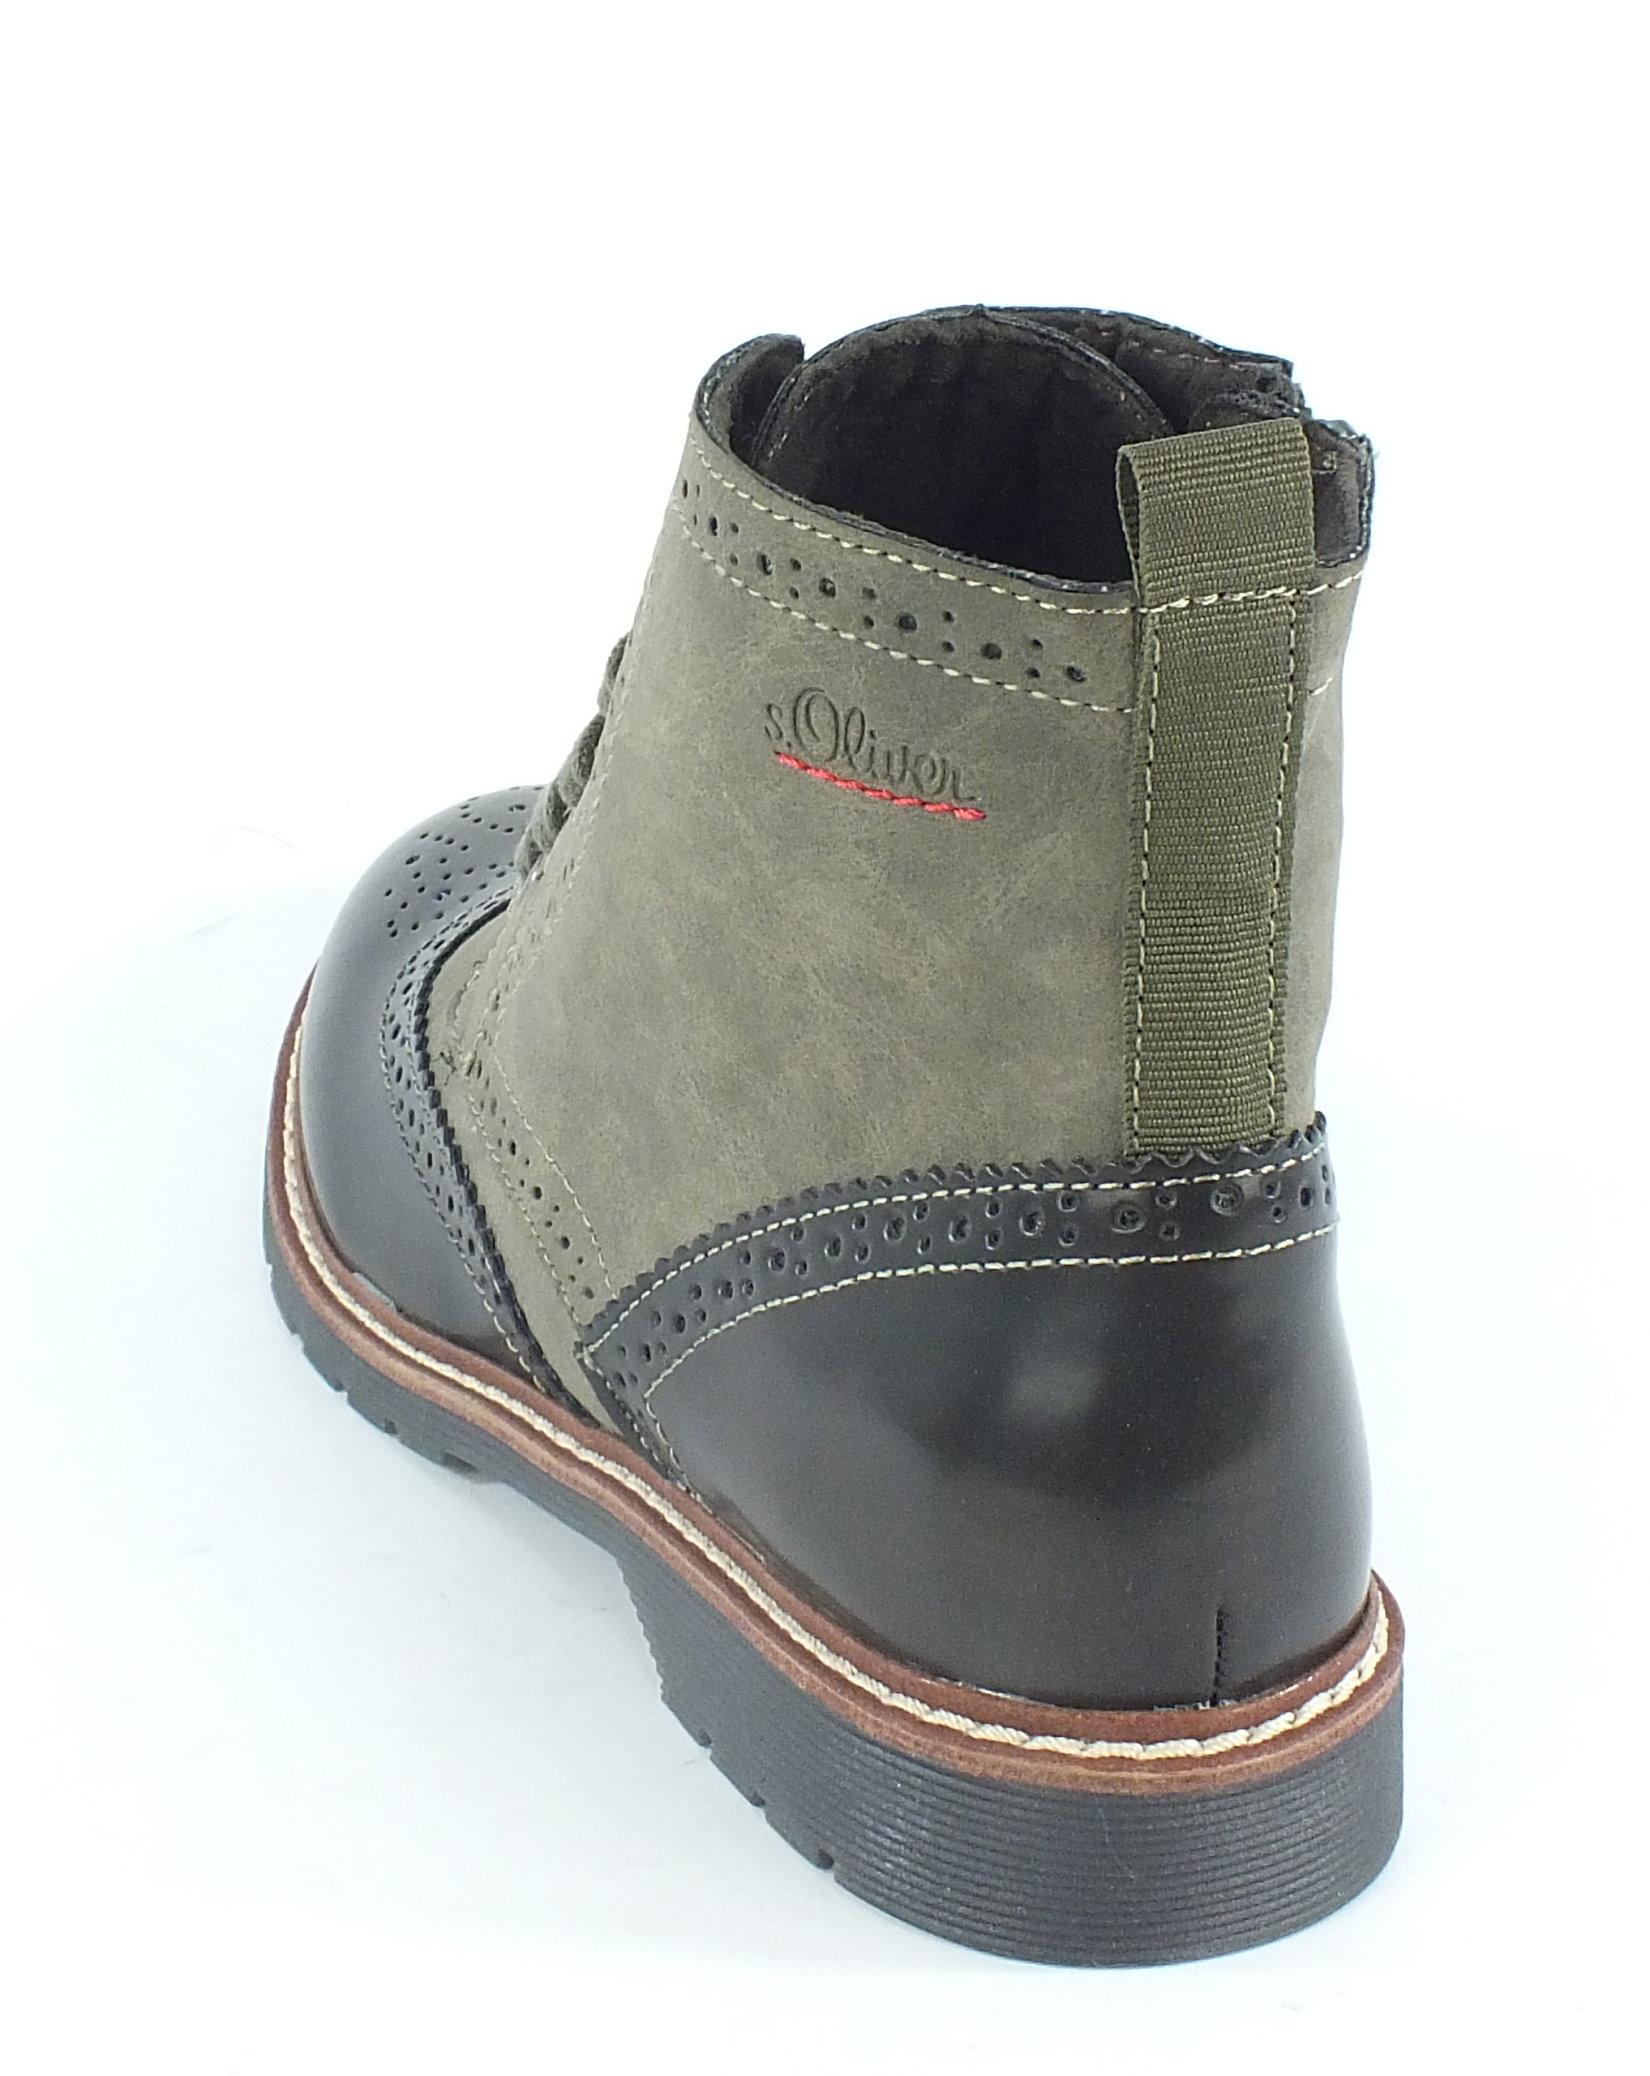 s oliver stiefelette stiefel boots khaki 10009 ebay. Black Bedroom Furniture Sets. Home Design Ideas